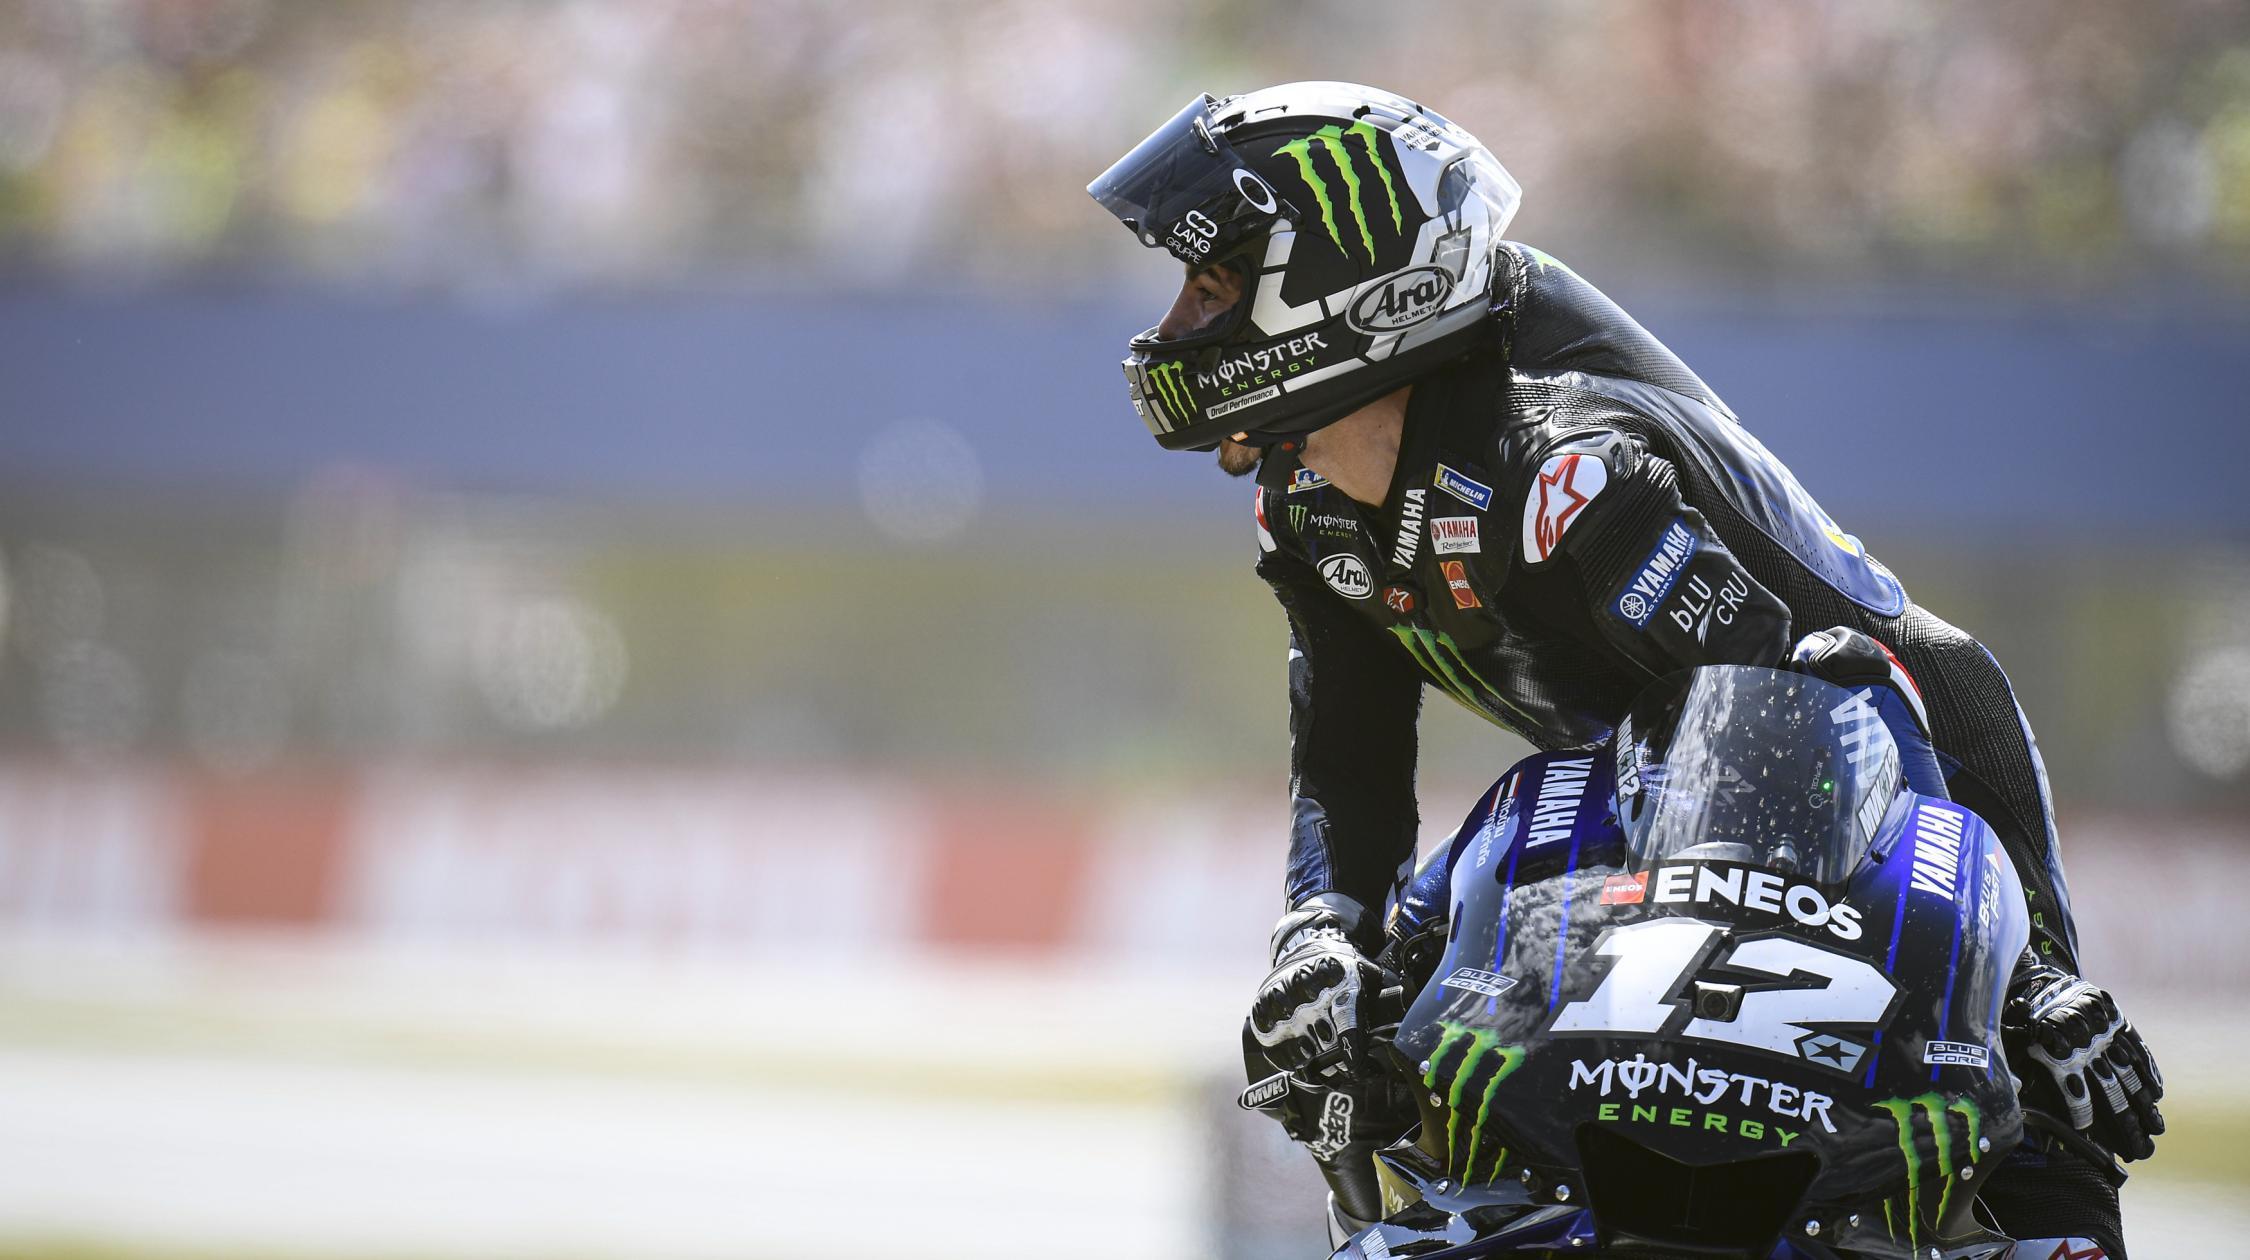 MotoGP2019Rd8ビニャーレス